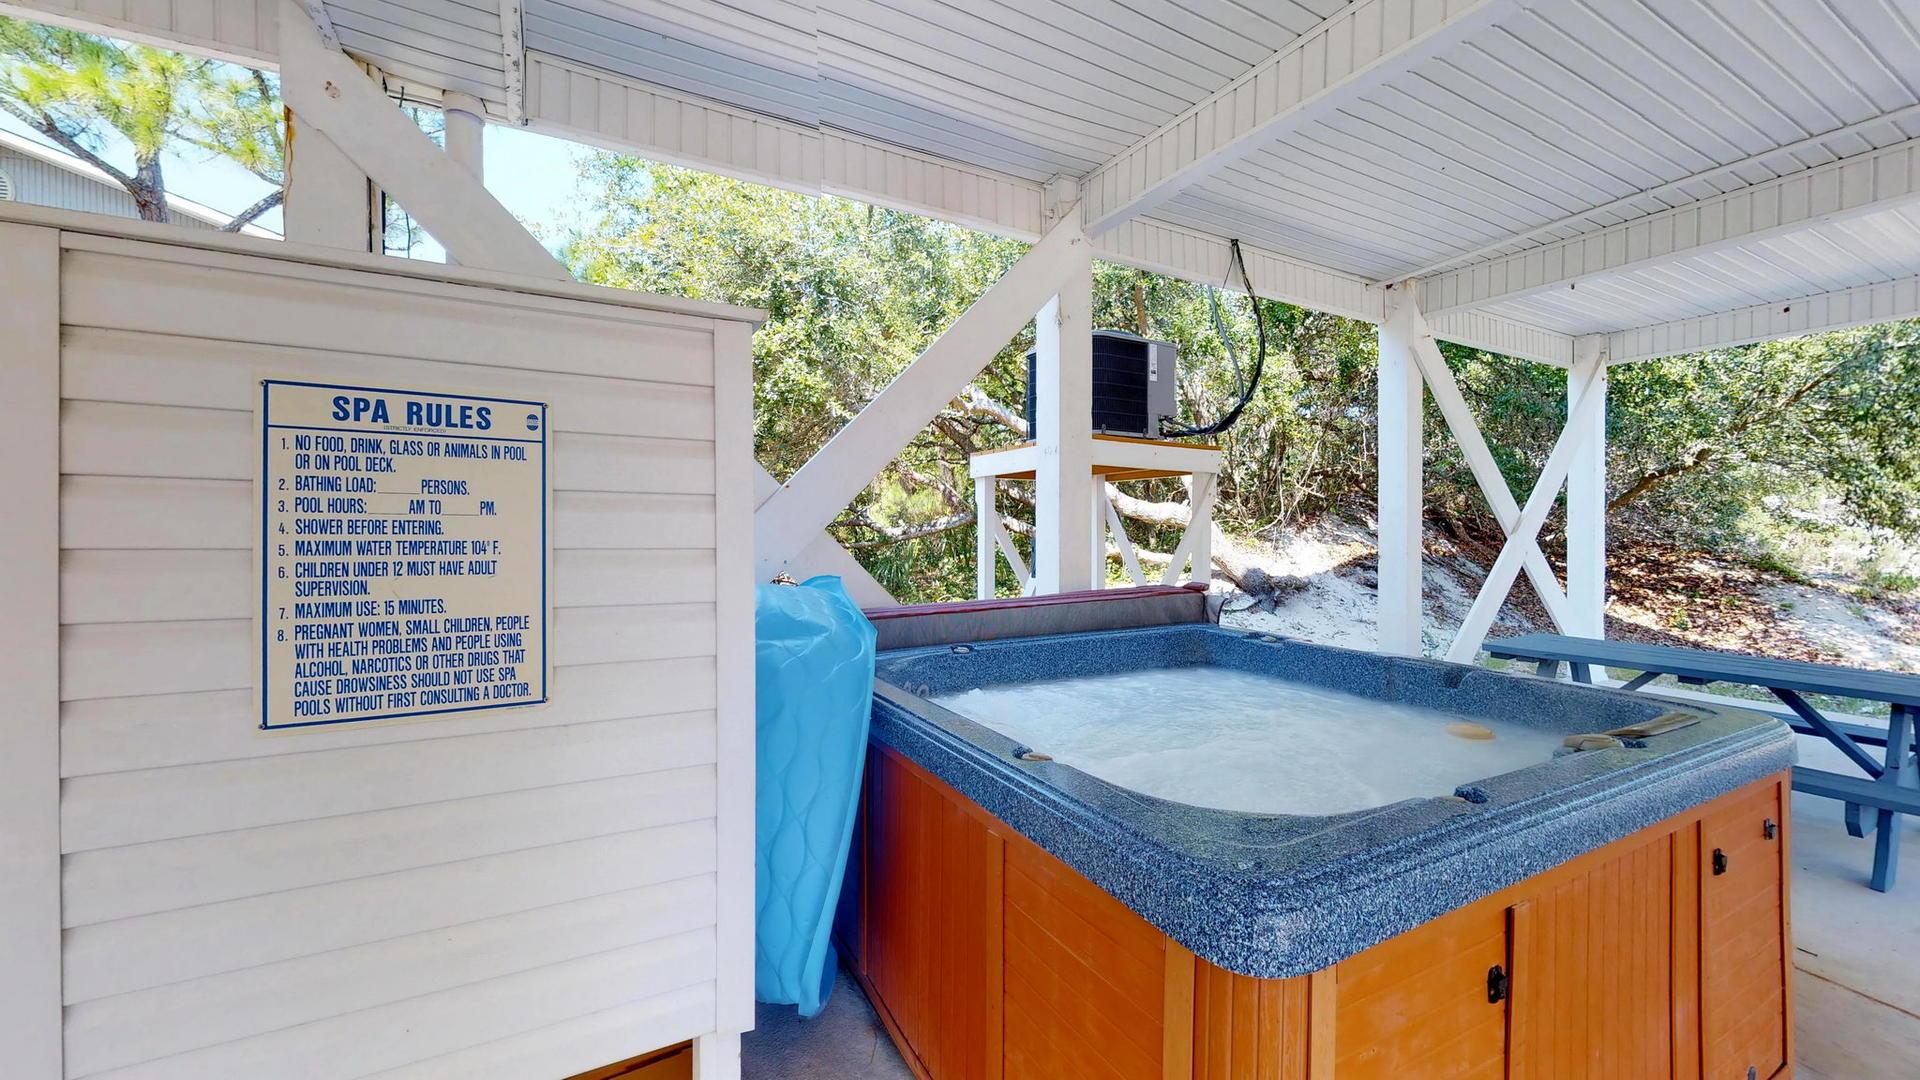 Relaxing Hot Tub an Outdoor Shower